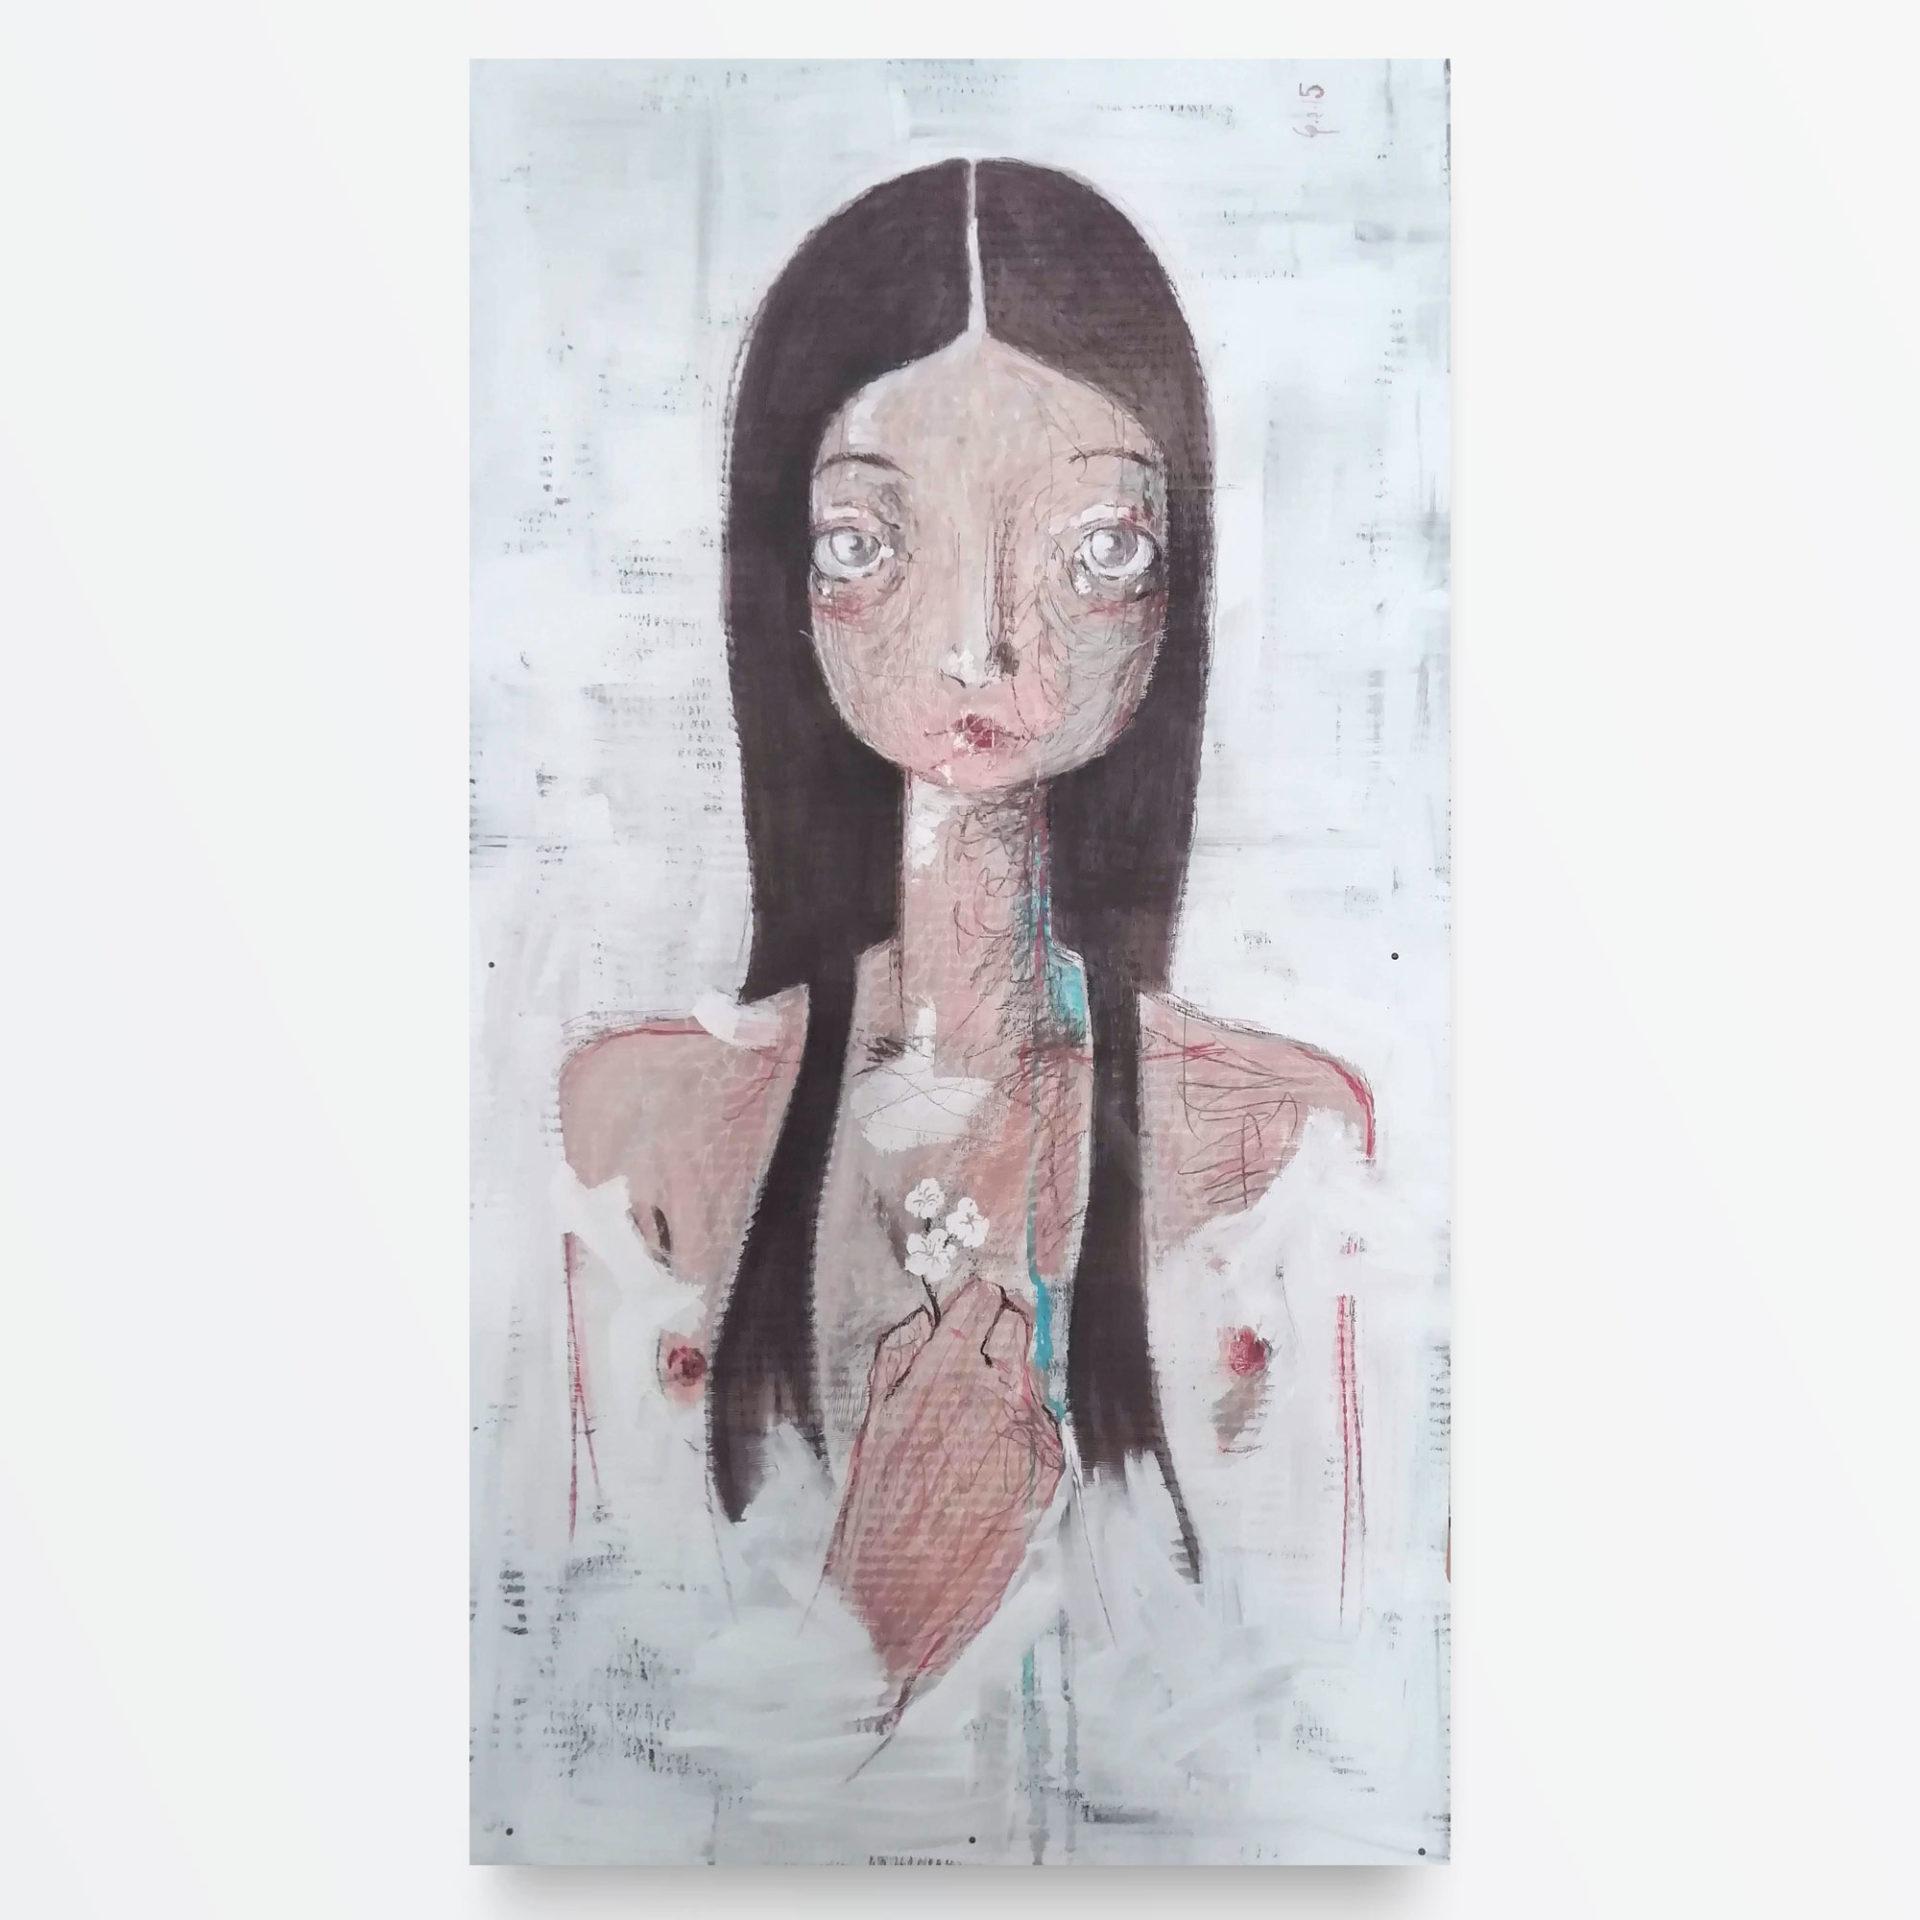 2015 La Sposa Bambina Arte Sacra di Diego Gabriele